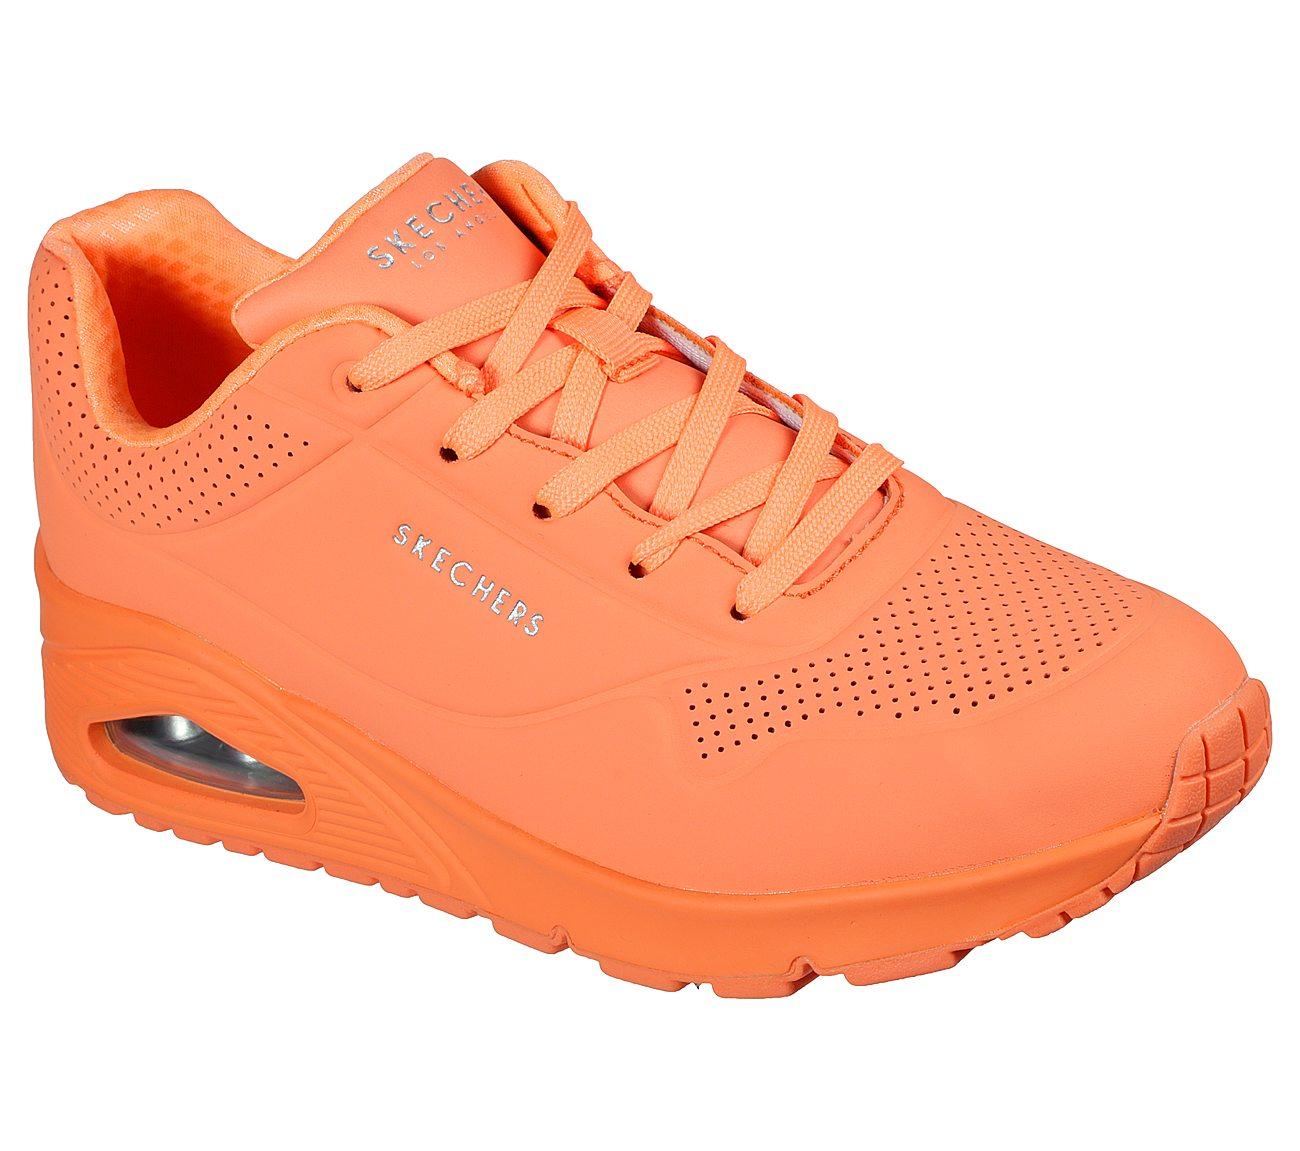 skechers orange